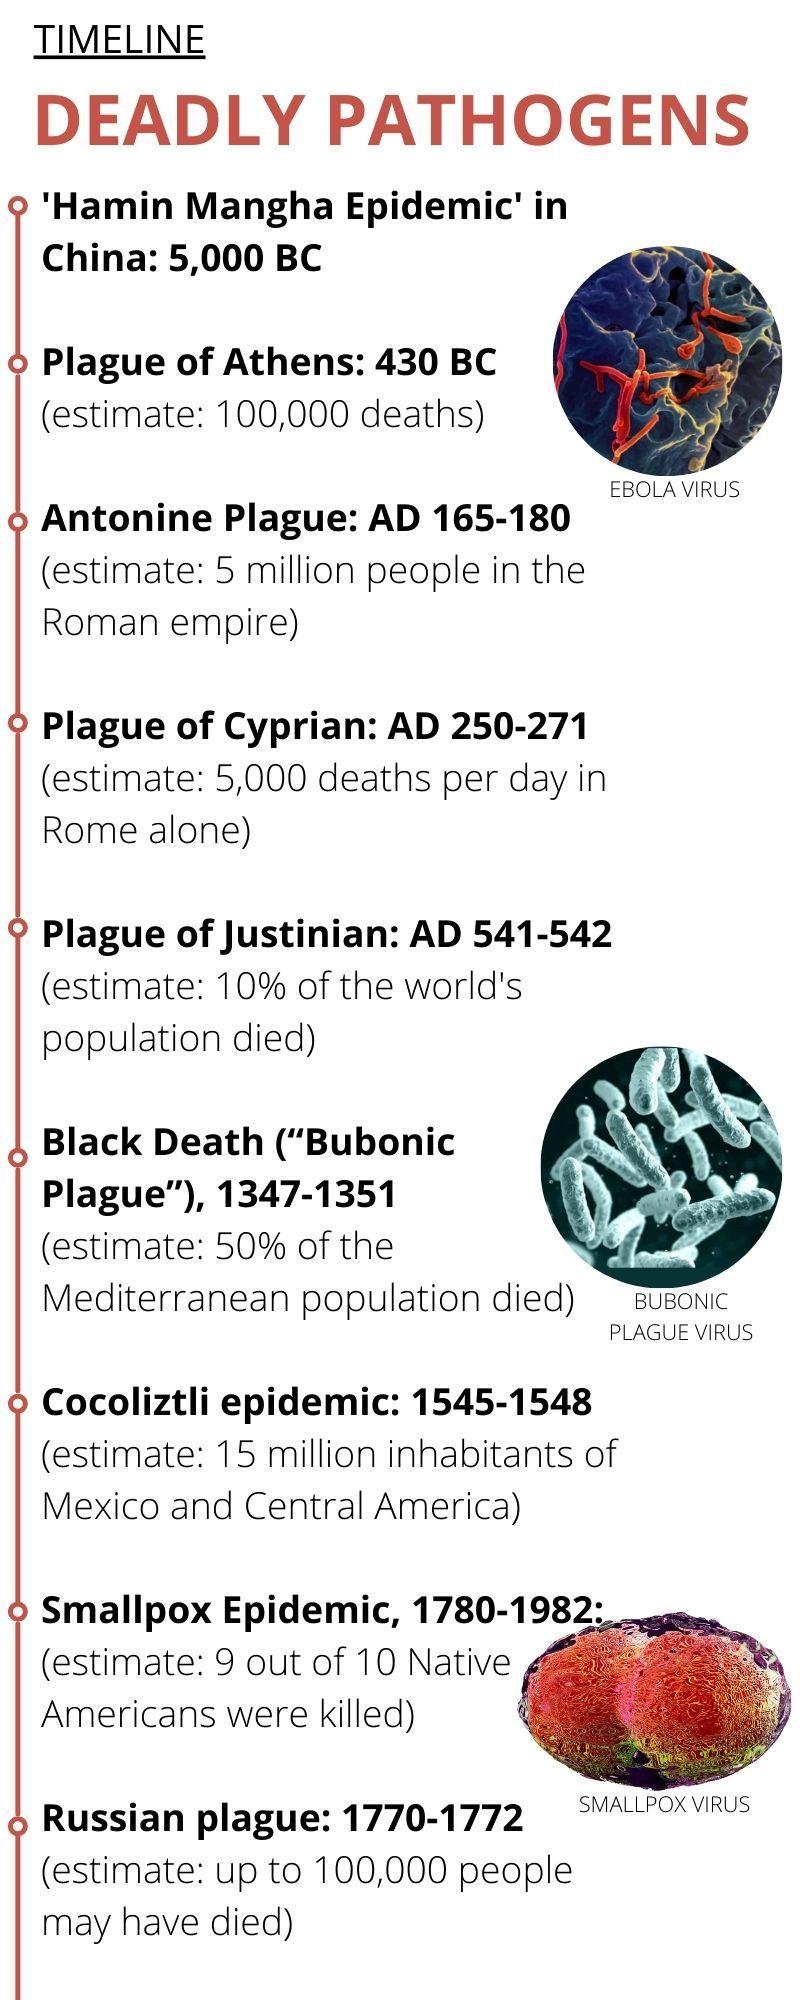 deadly pathogens